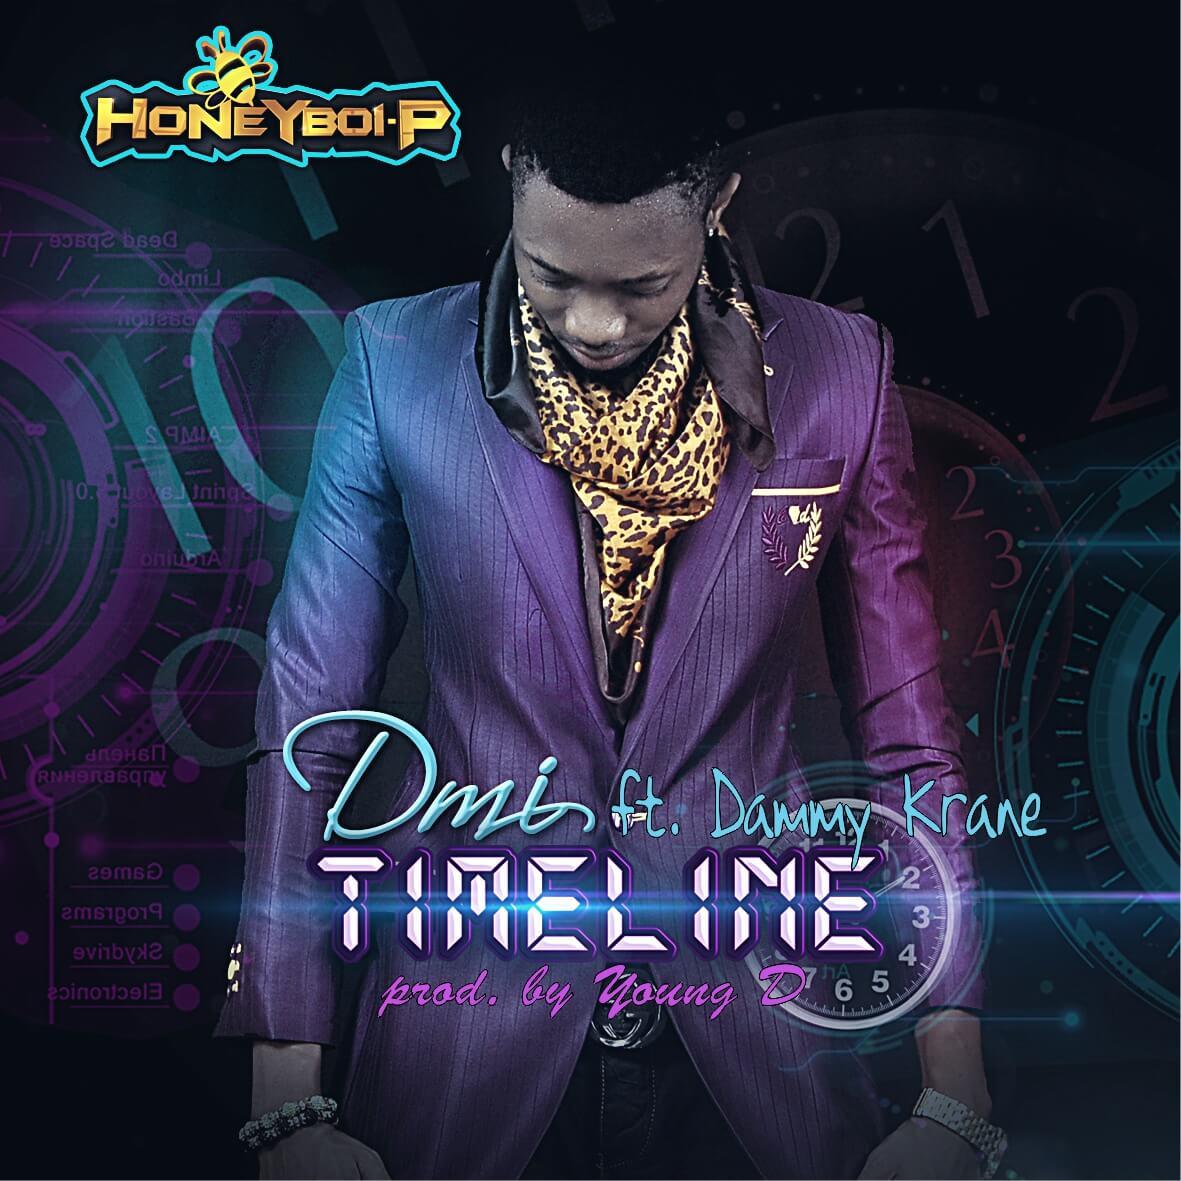 DMI ft. Dammy Krane - TIMELINE [prod. by Young D] Artwork